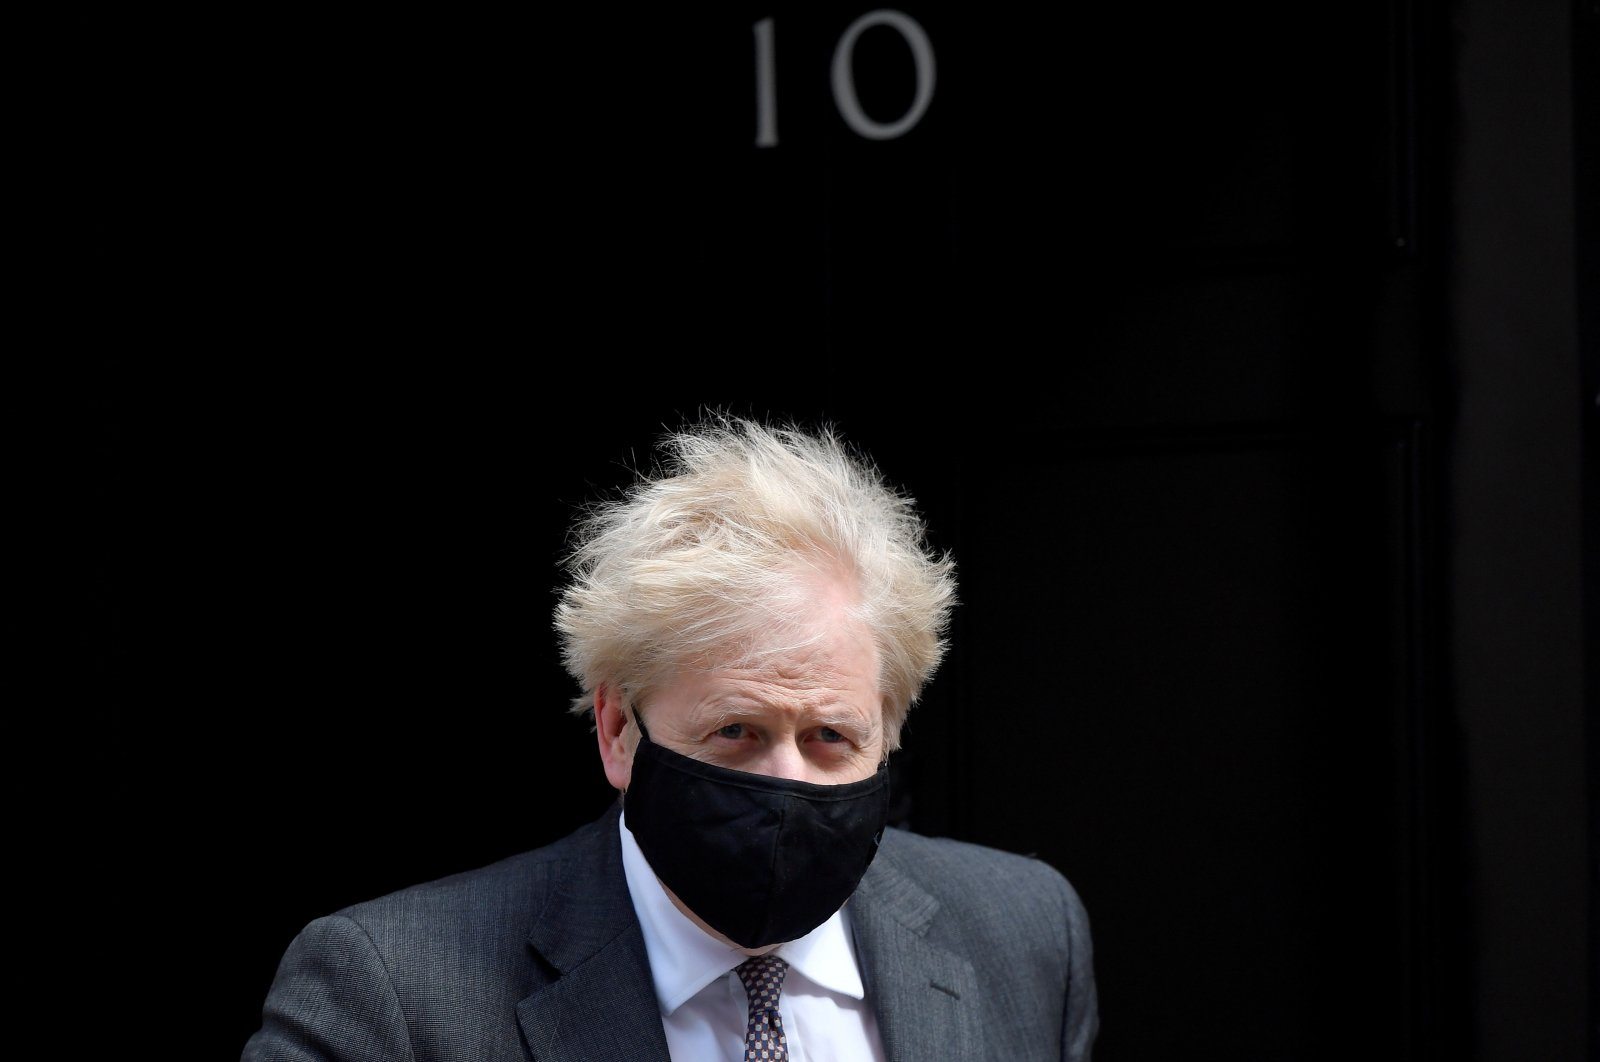 Britain's Prime Minister Boris Johnson leaves Downing Street, amid the coronavirus disease (COVID-19) pandemic, in London, Britain, April 21, 2021. (Rueters Photo)